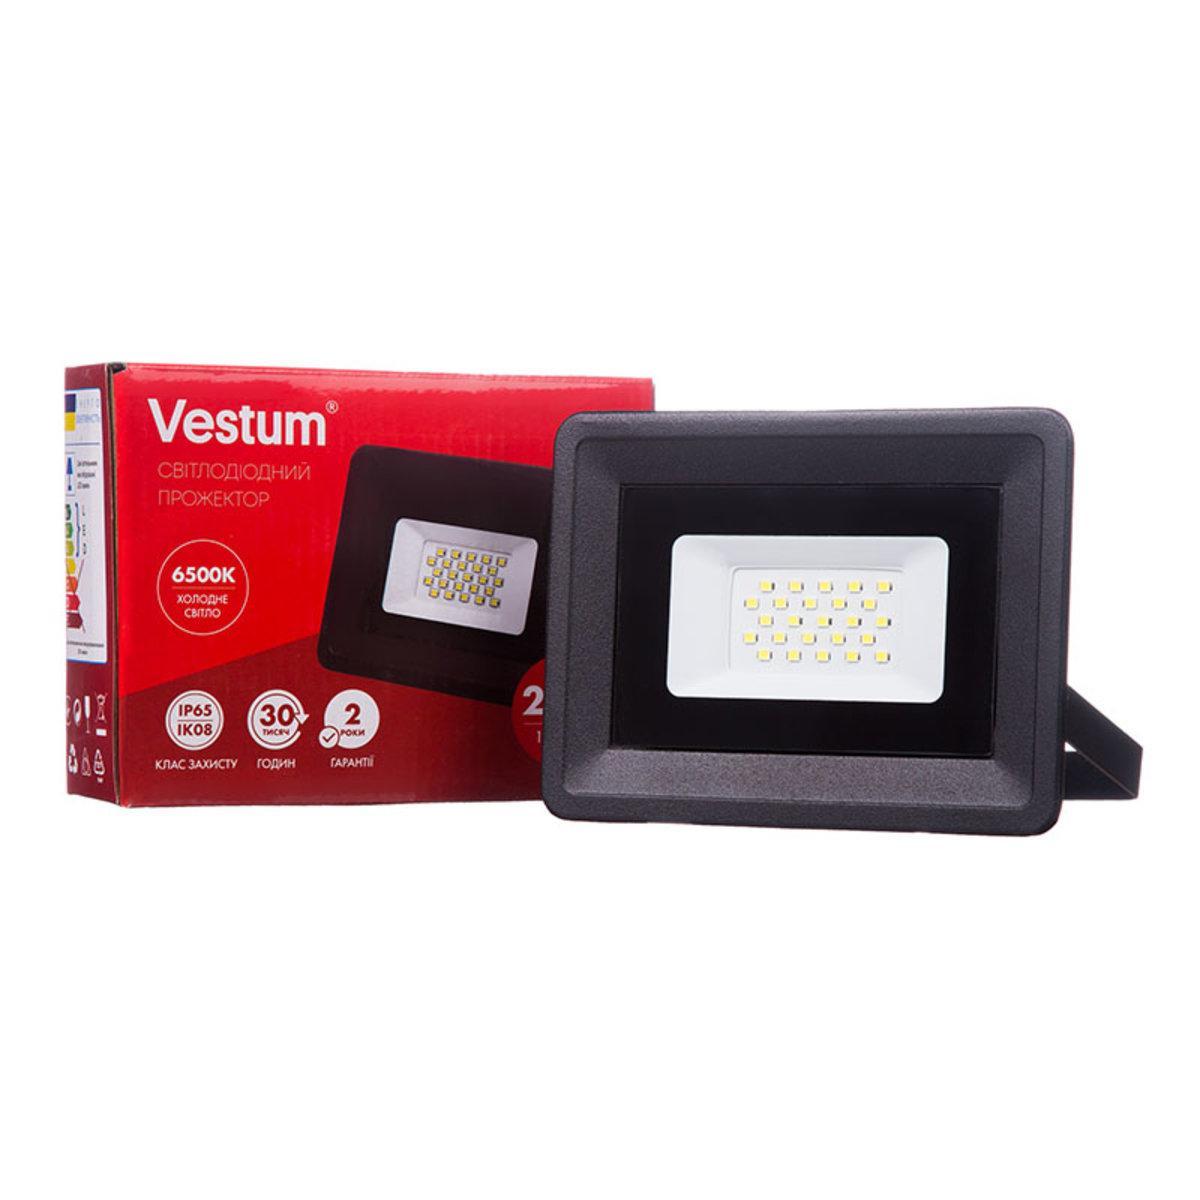 Прожектор LED Vestum 20W 1800Лм 6500K 185-265V IP65